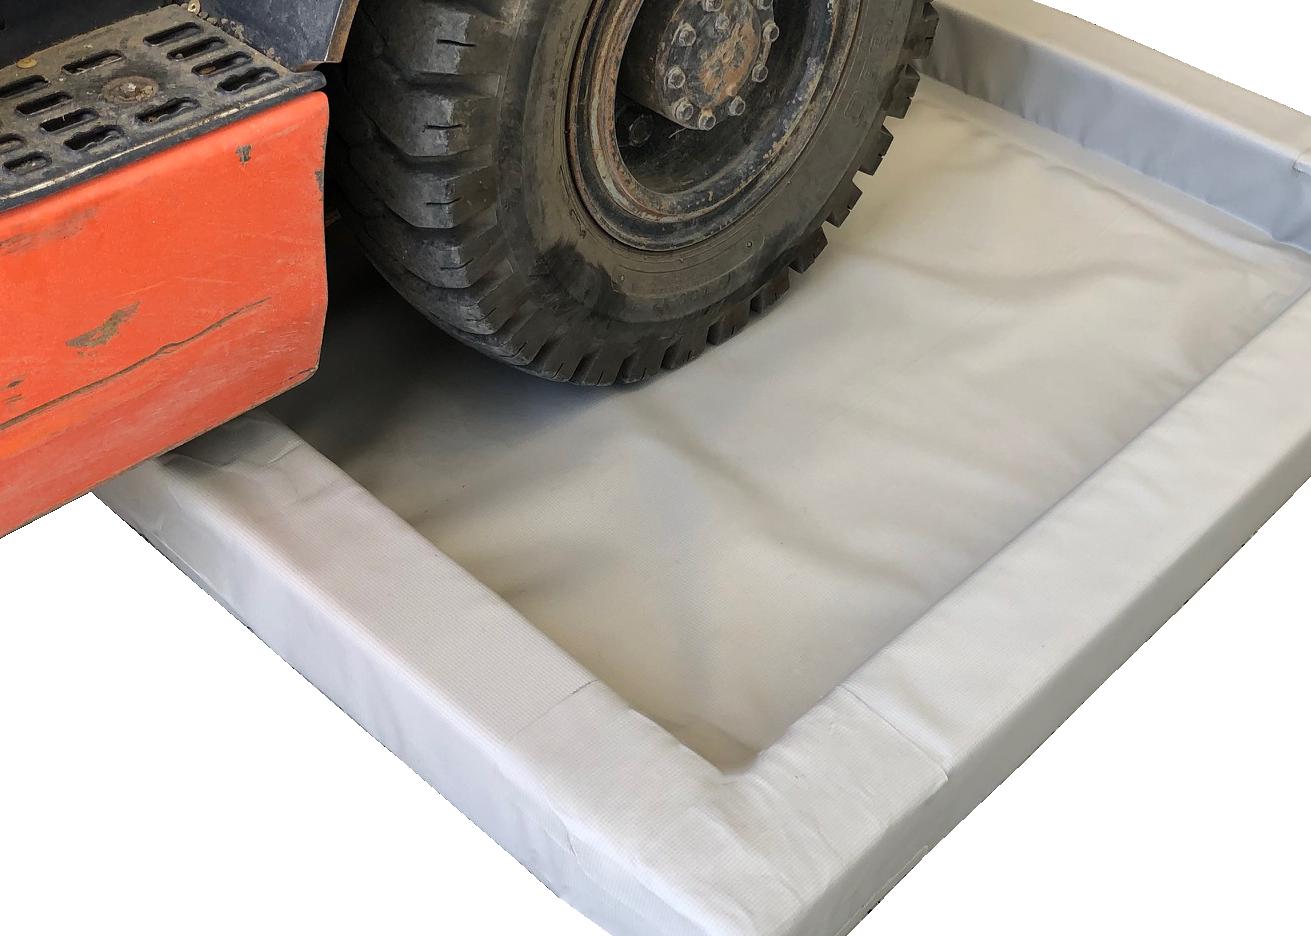 Forklift in Berm - 7.9.20.png